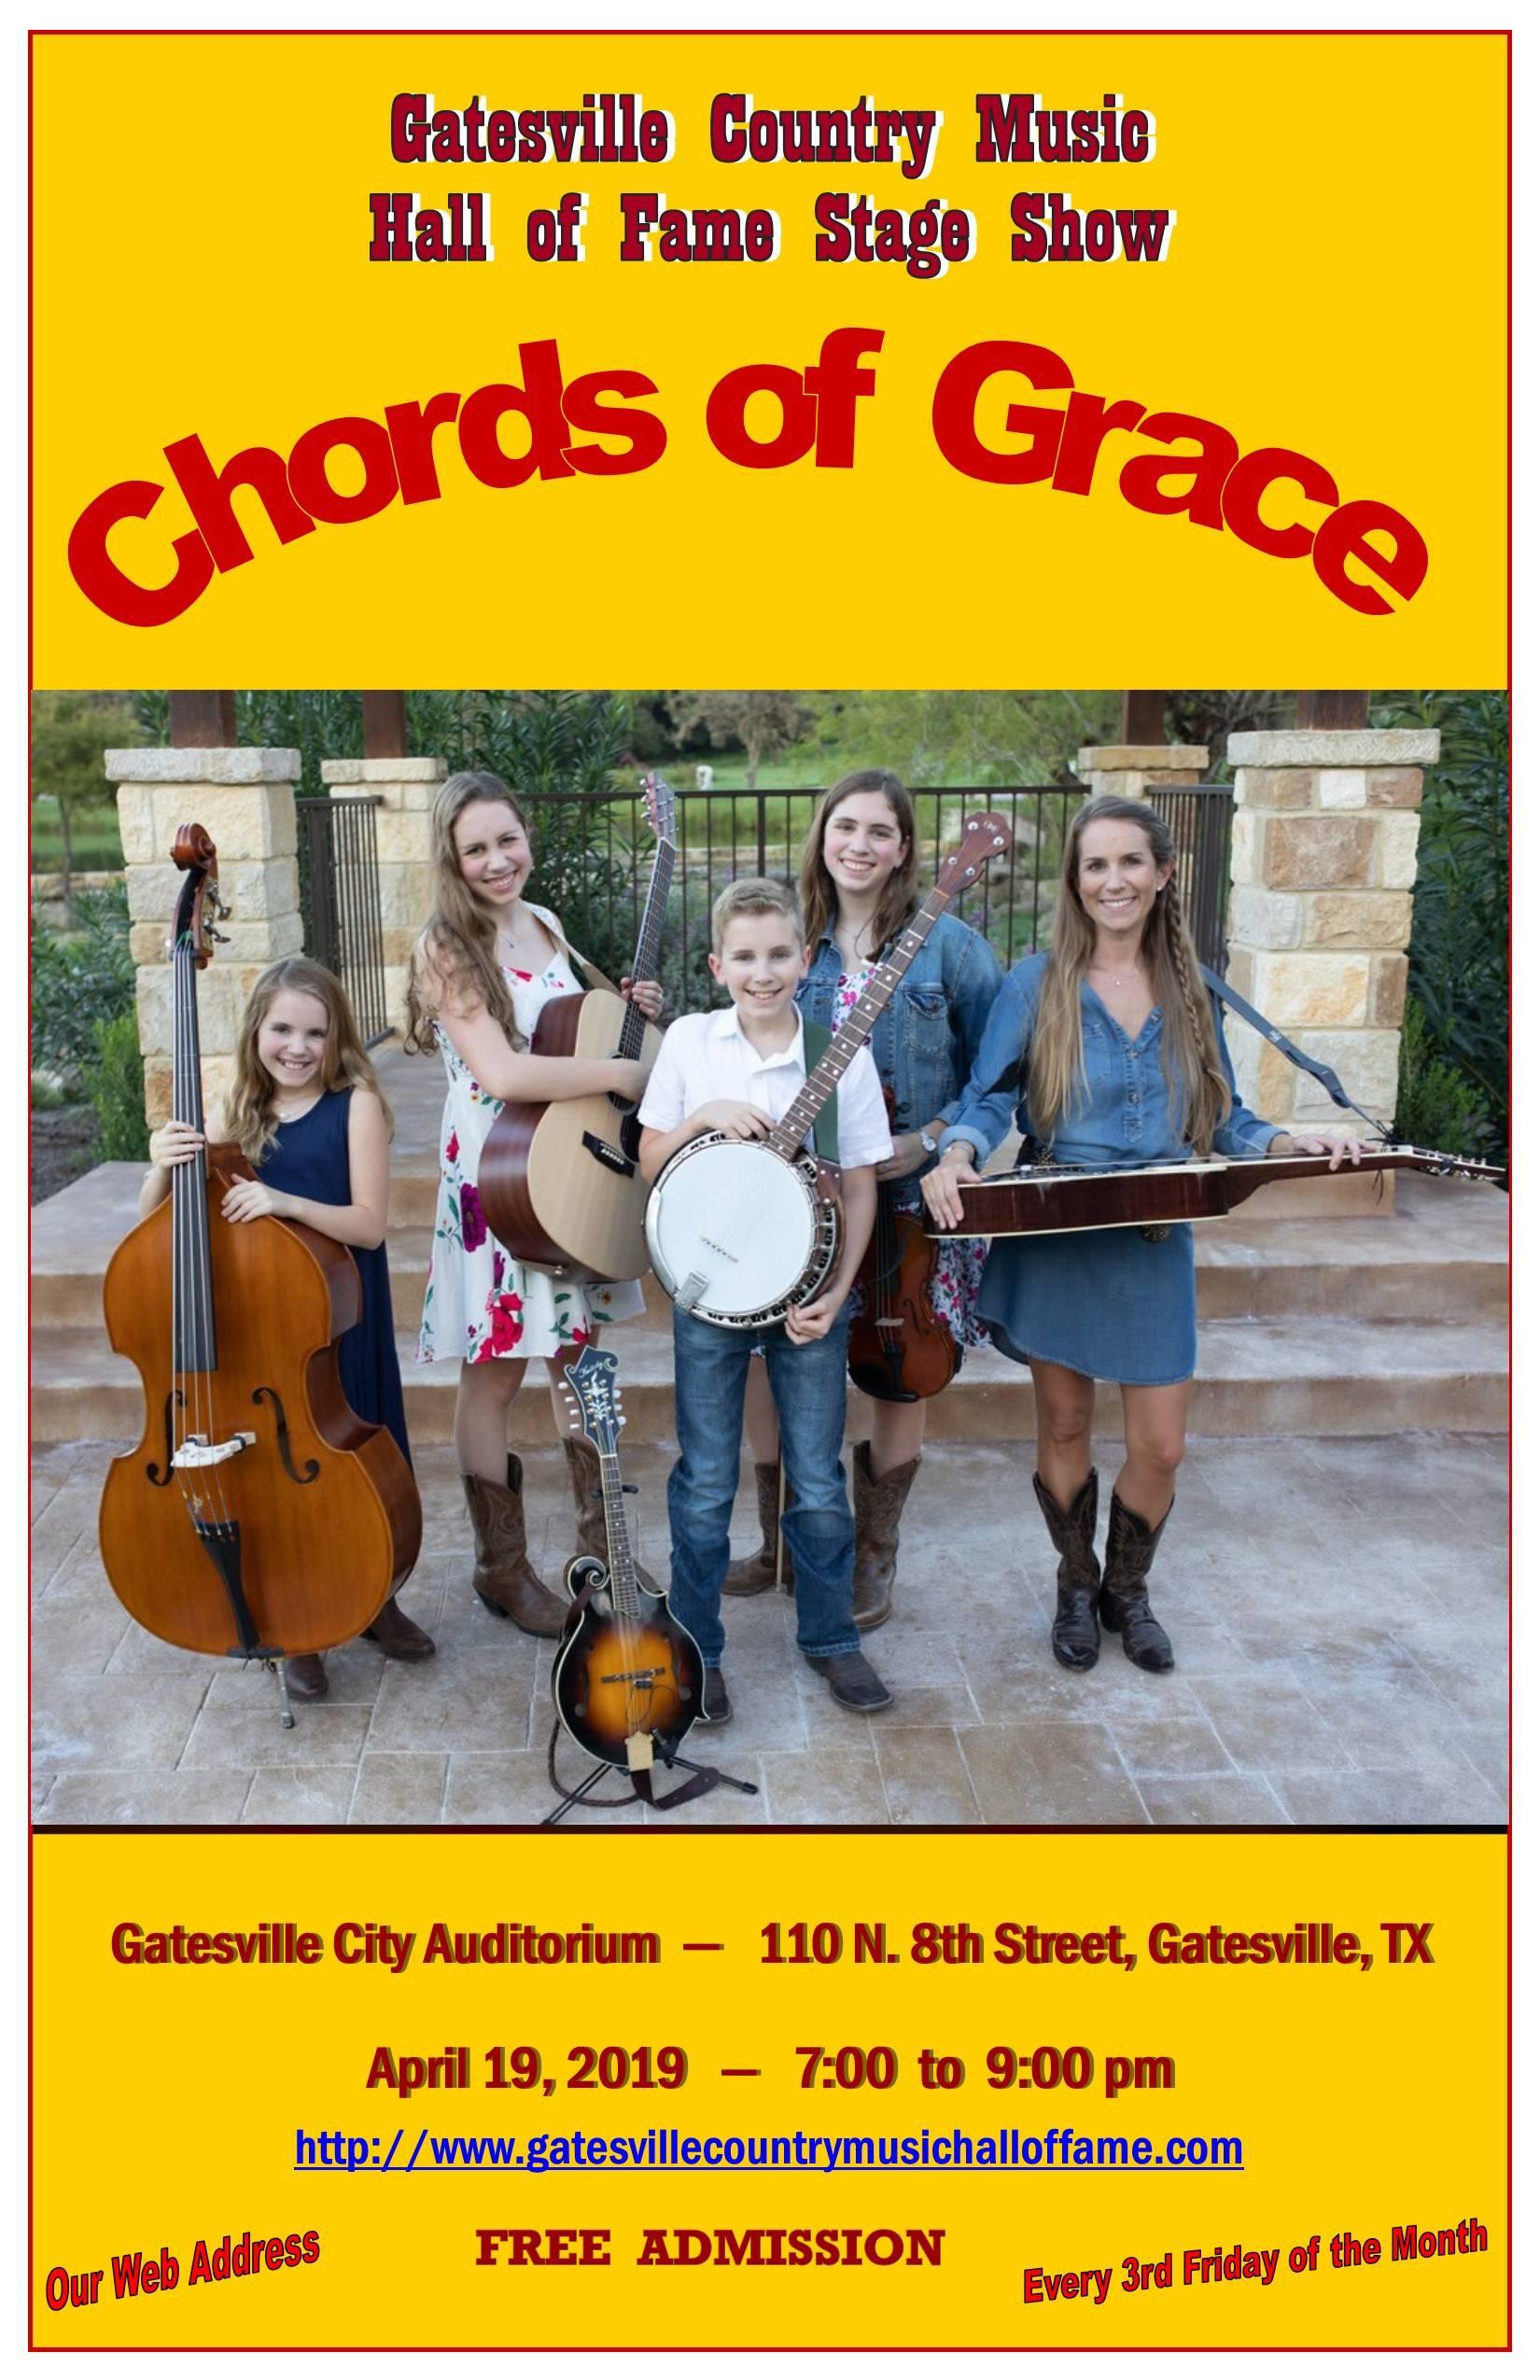 Chords of Grace, April 19, 2019